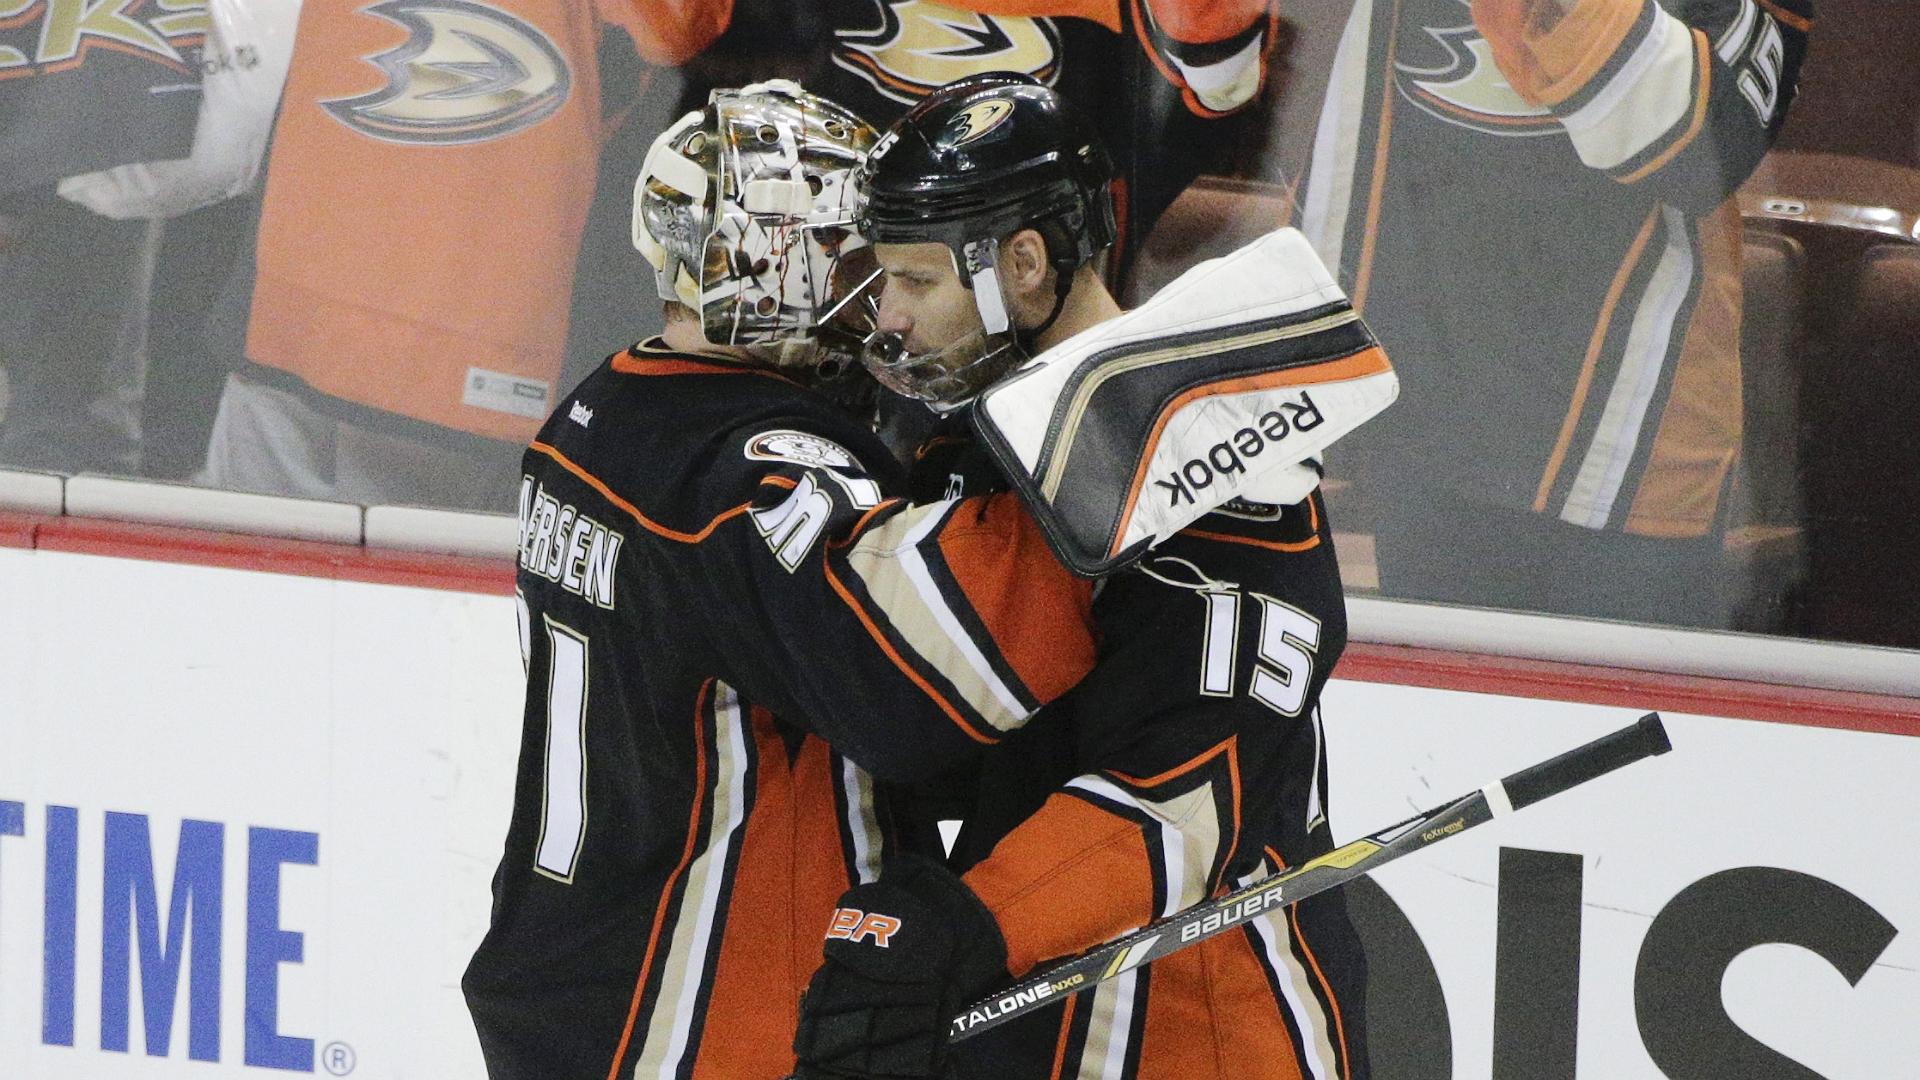 Stanley Cup playoffs 2014: Getzlaf leads Ducks past Stars 6